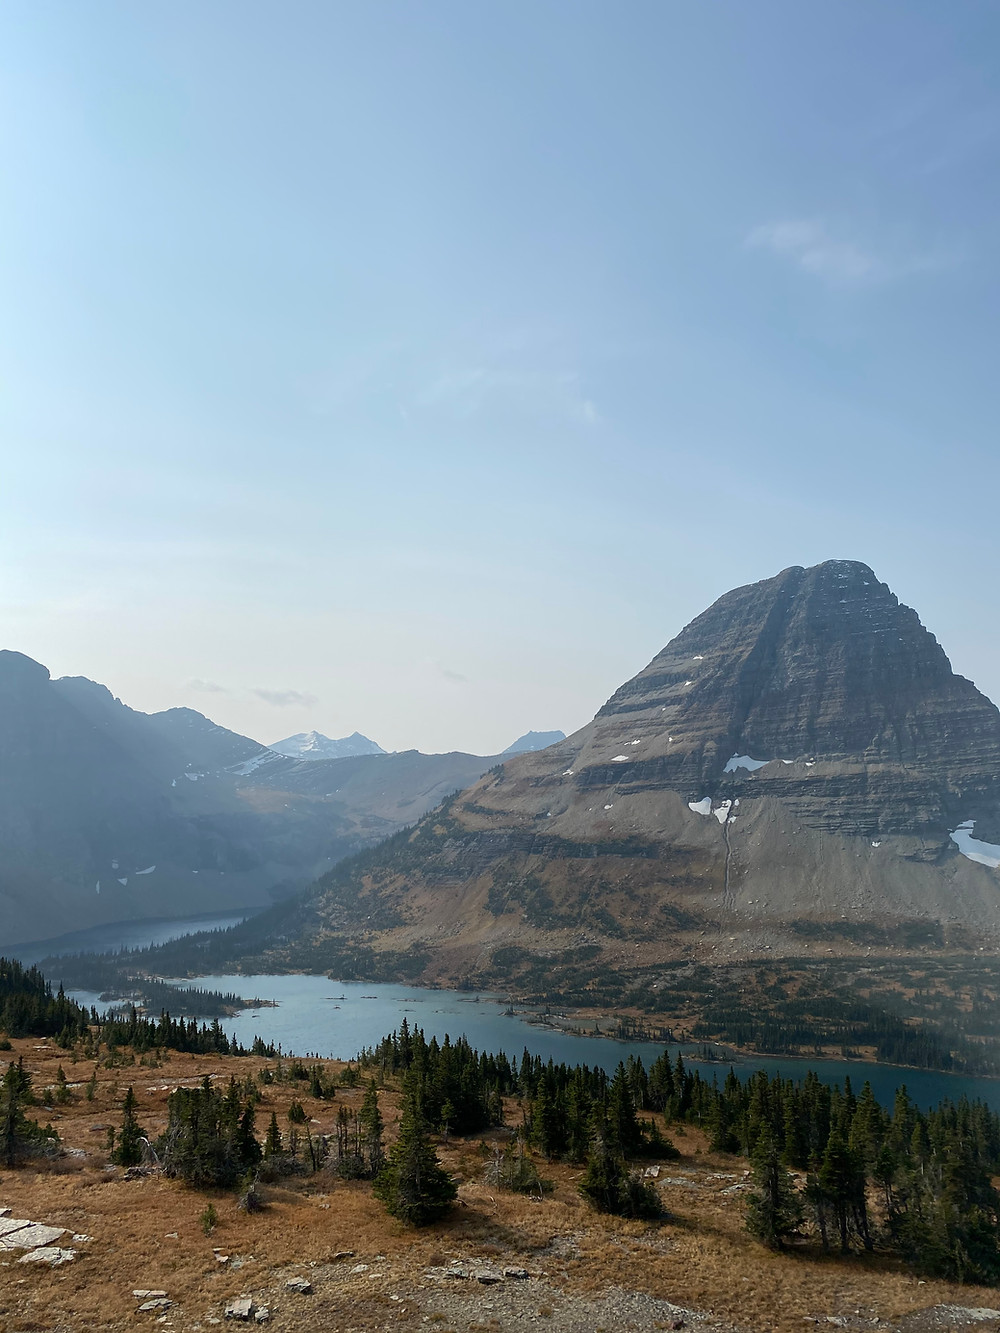 Glacier National Park in all its striated, hazy glory